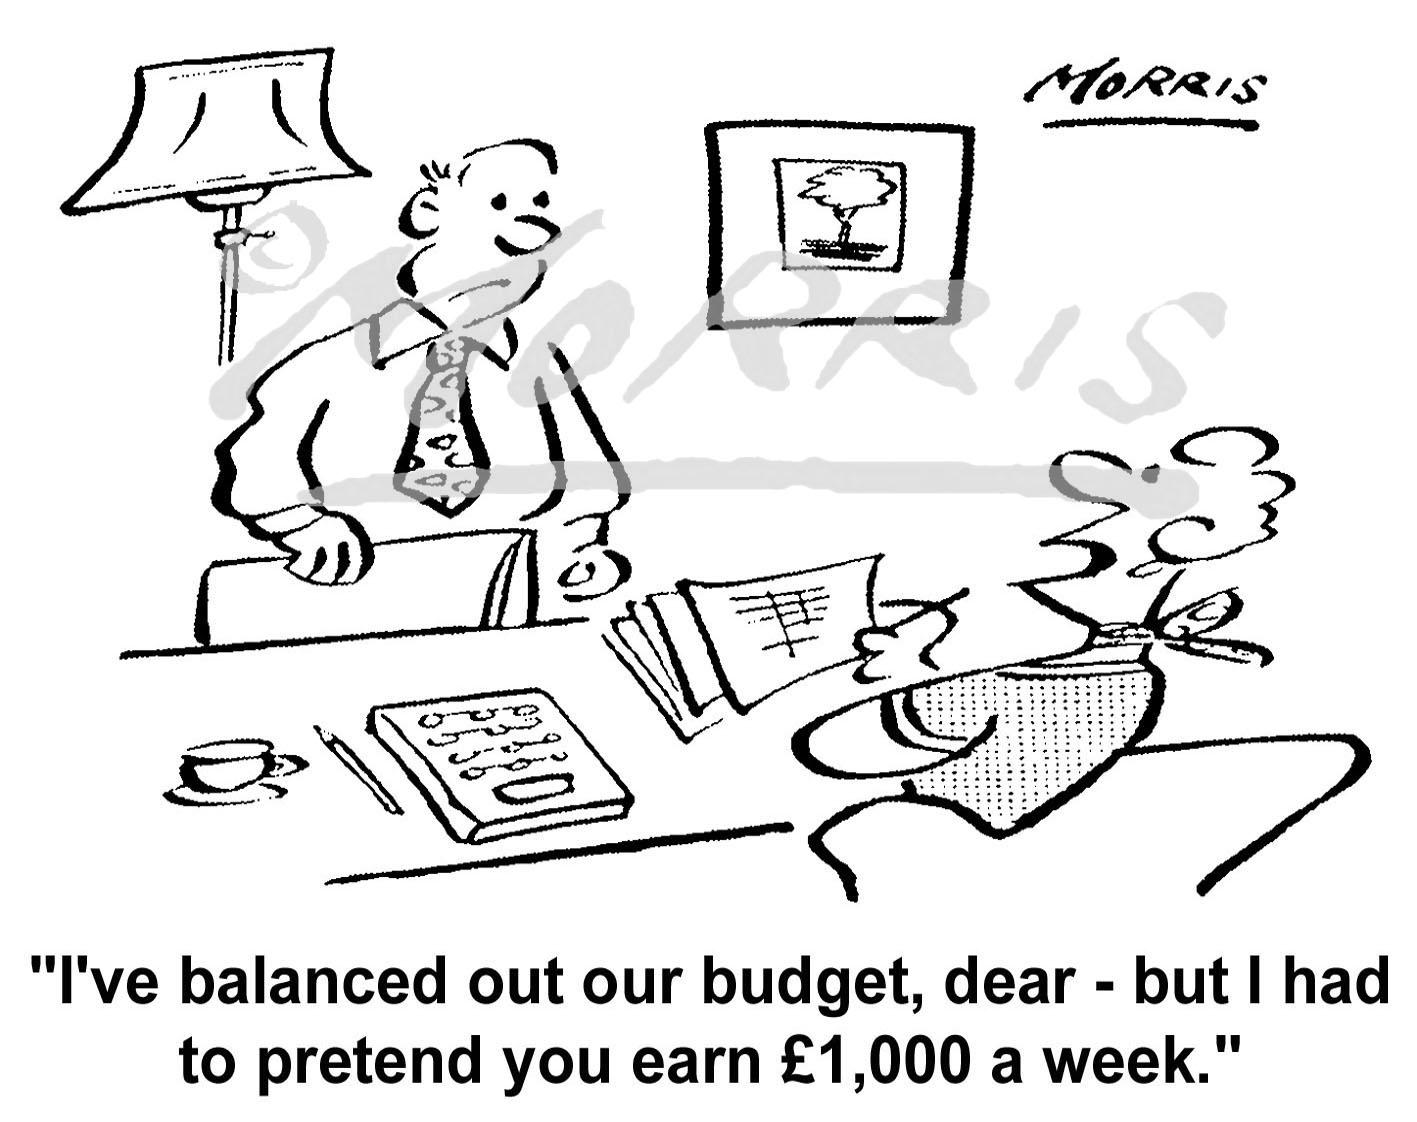 Family finance budget cartoon – Ref: 5996bw | Business cartoons